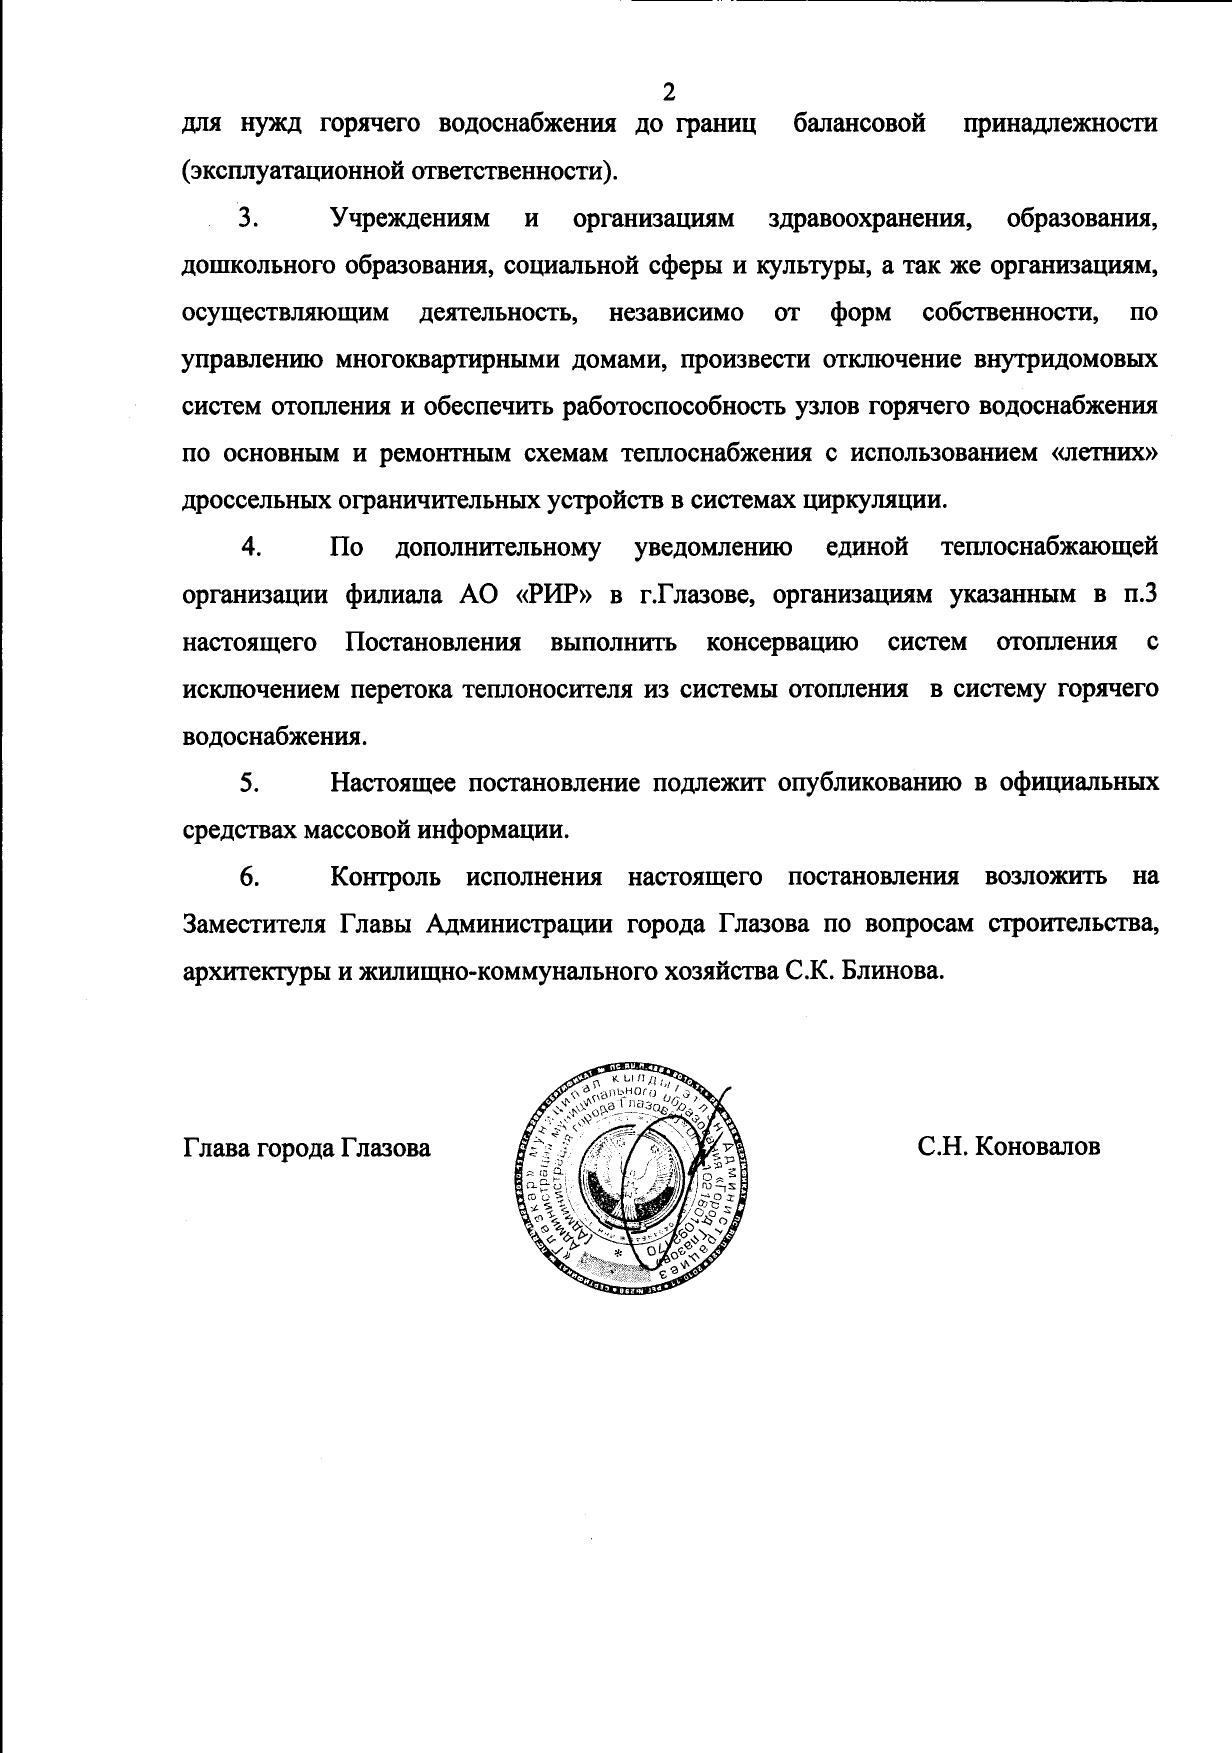 Постановление №17_18 от 07-05_page-0002